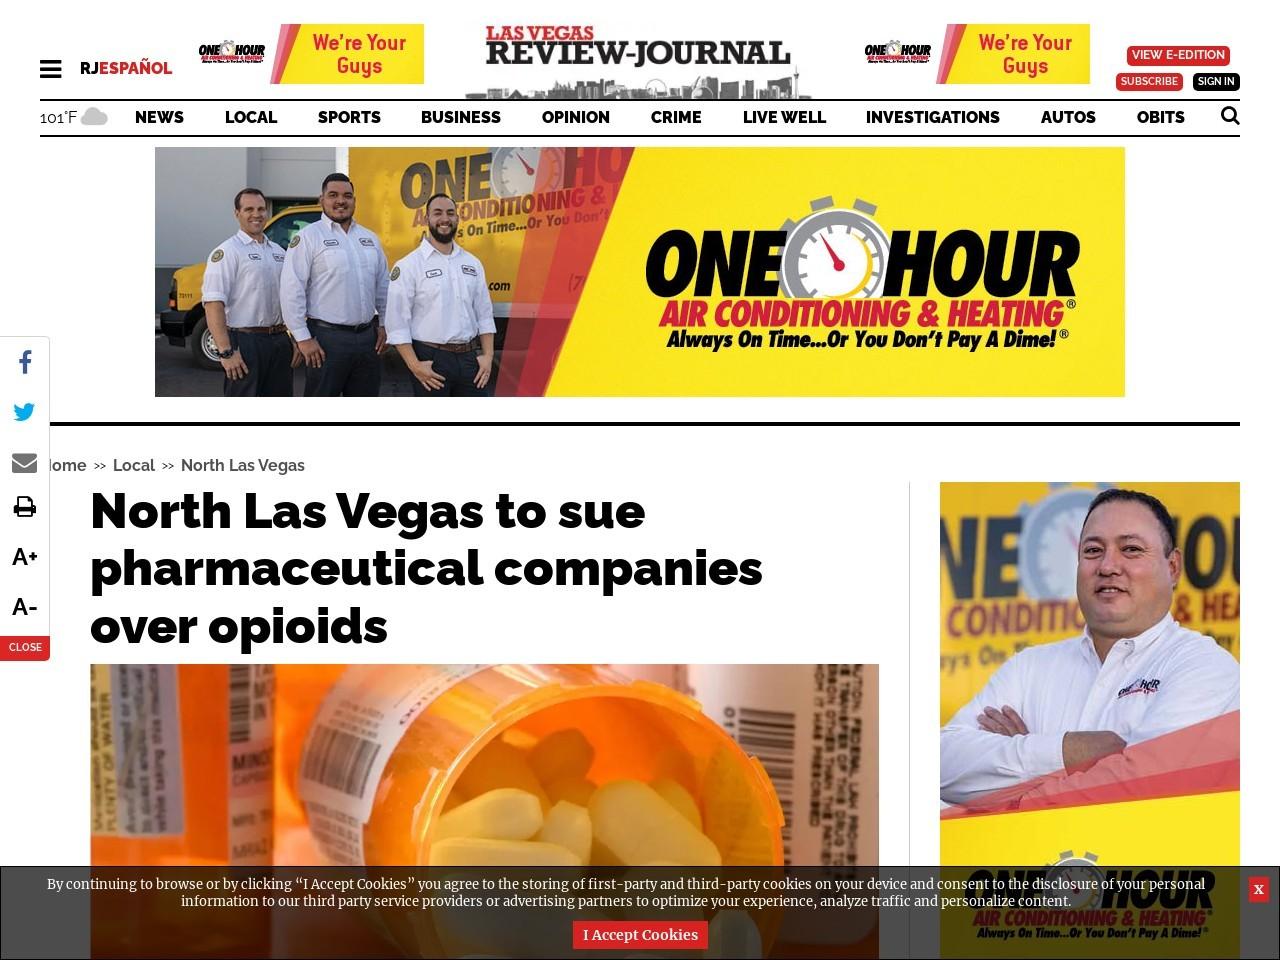 North Las Vegas to sue pharmaceutical companies over opioids